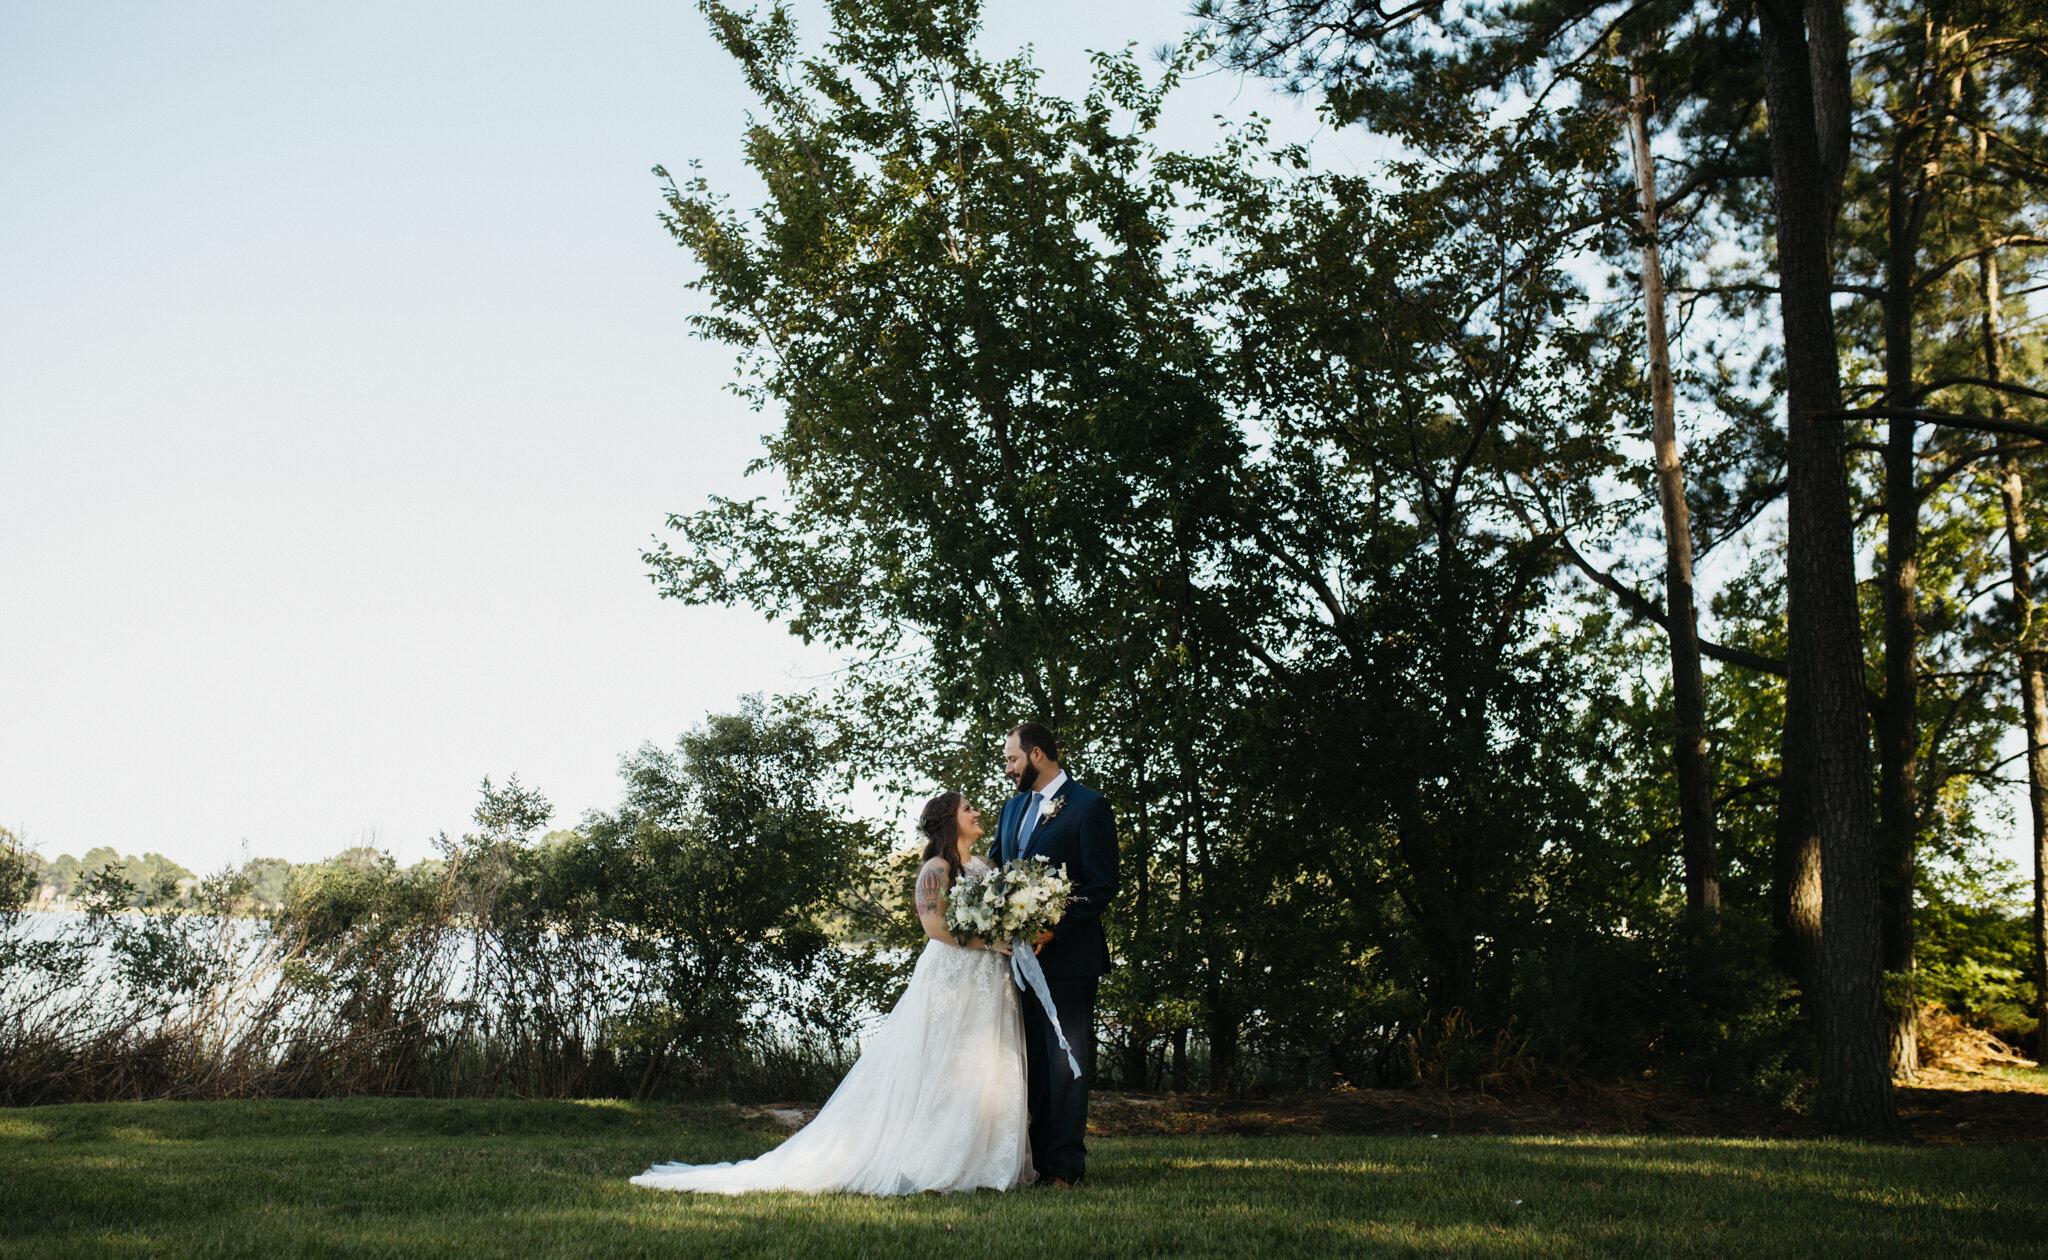 angela_jason_norfolk_wedding-57.jpg